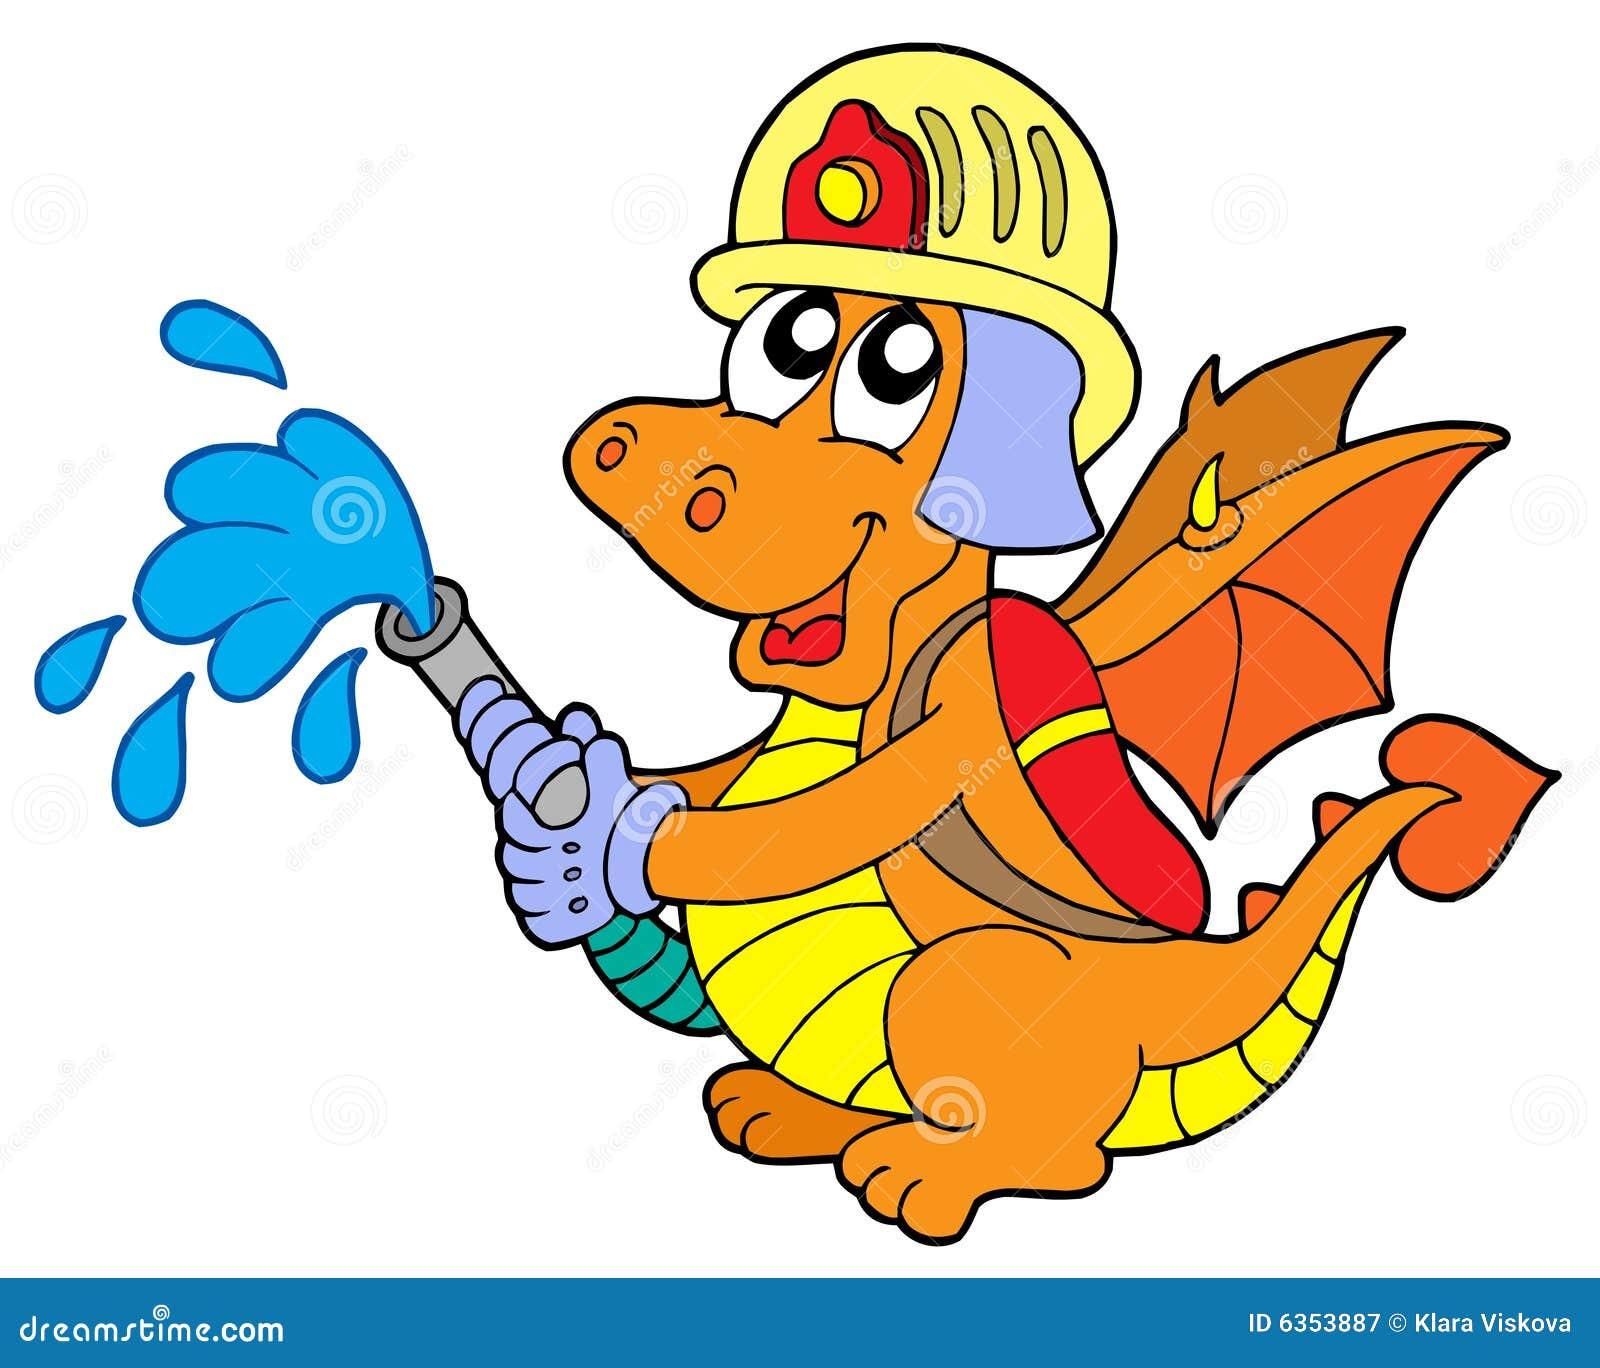 Fireman dragon